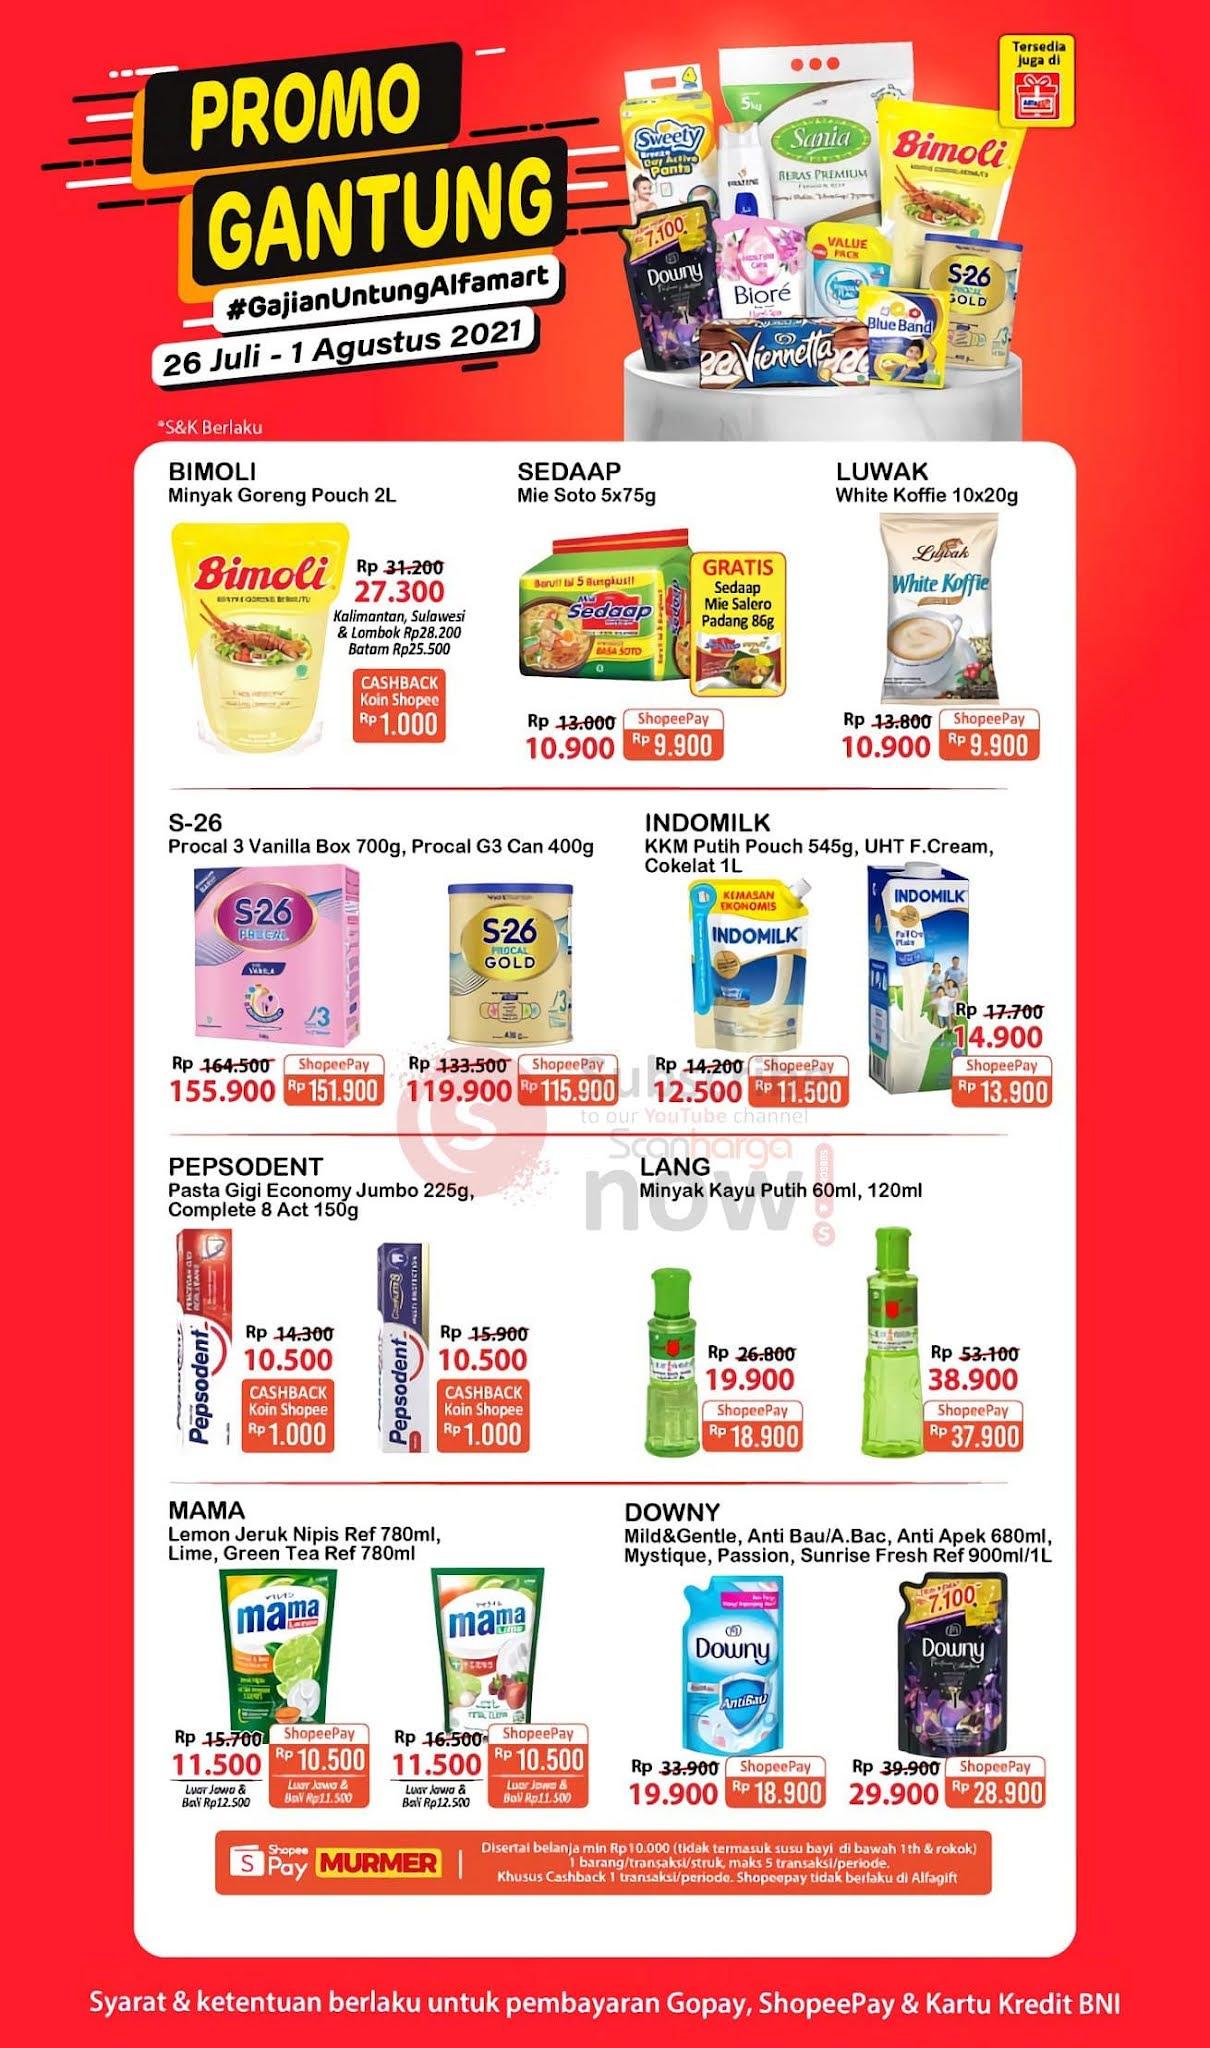 Katalog Promo JSM Alfamart 26 Juli - 1 Agustus 2021 1